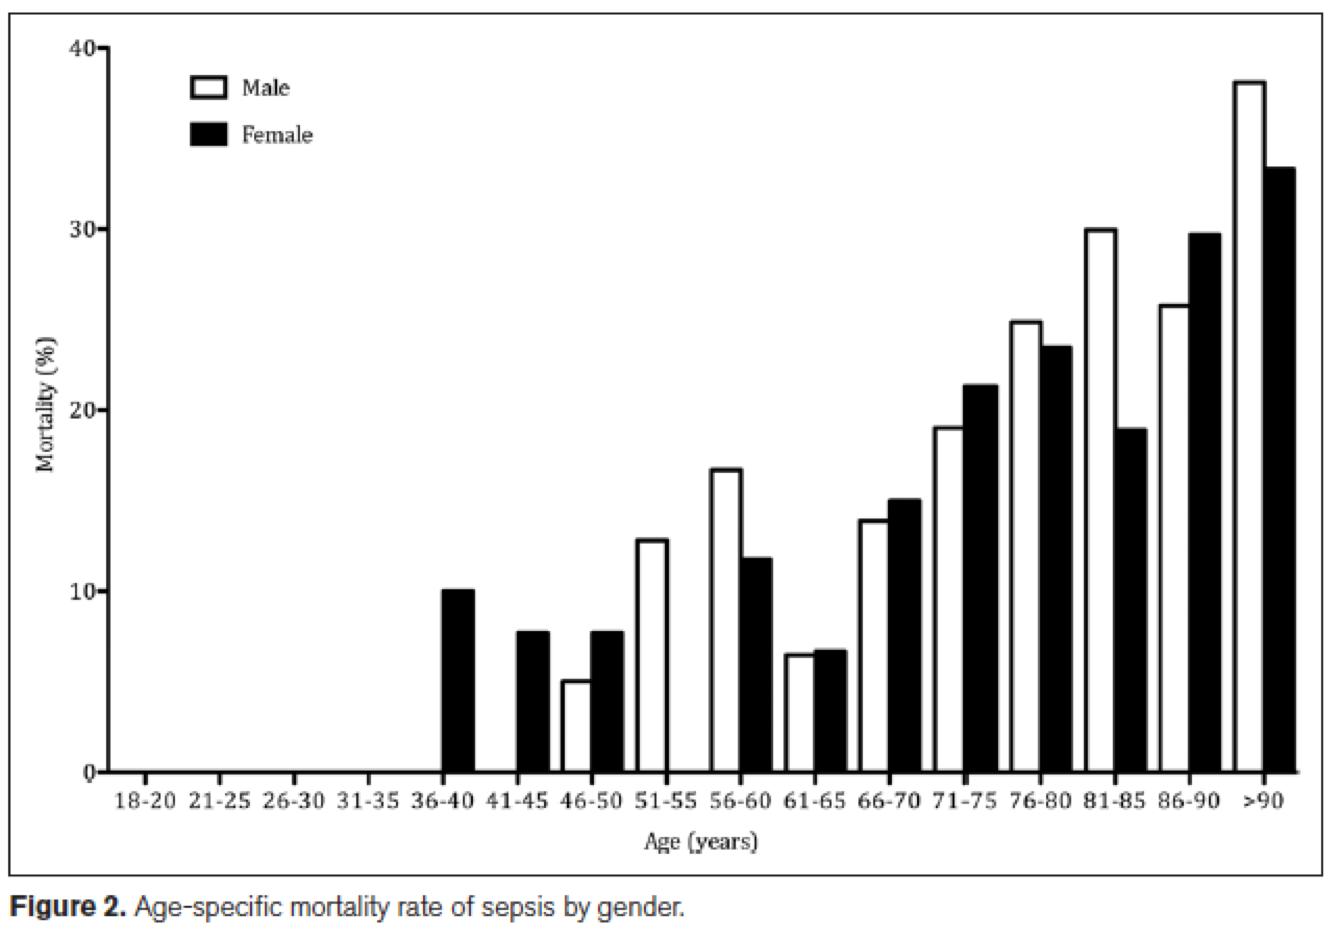 [Crit Care Med在线发表]:基于人口的全身性感染流行病学:中国数据